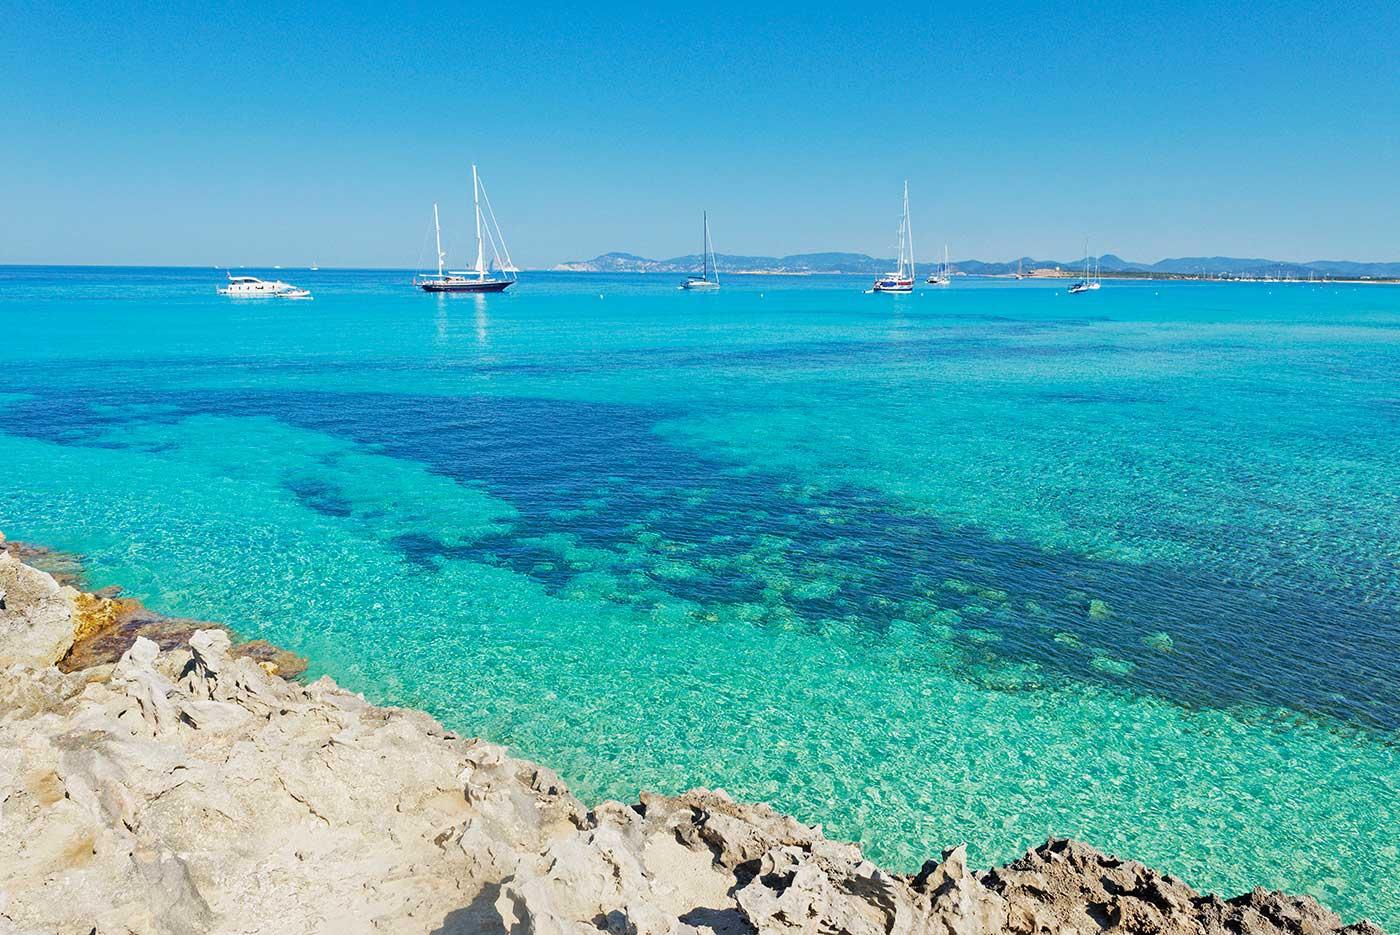 alquiler-barcos-Formentera, playa-de-ses-illetes-jpg